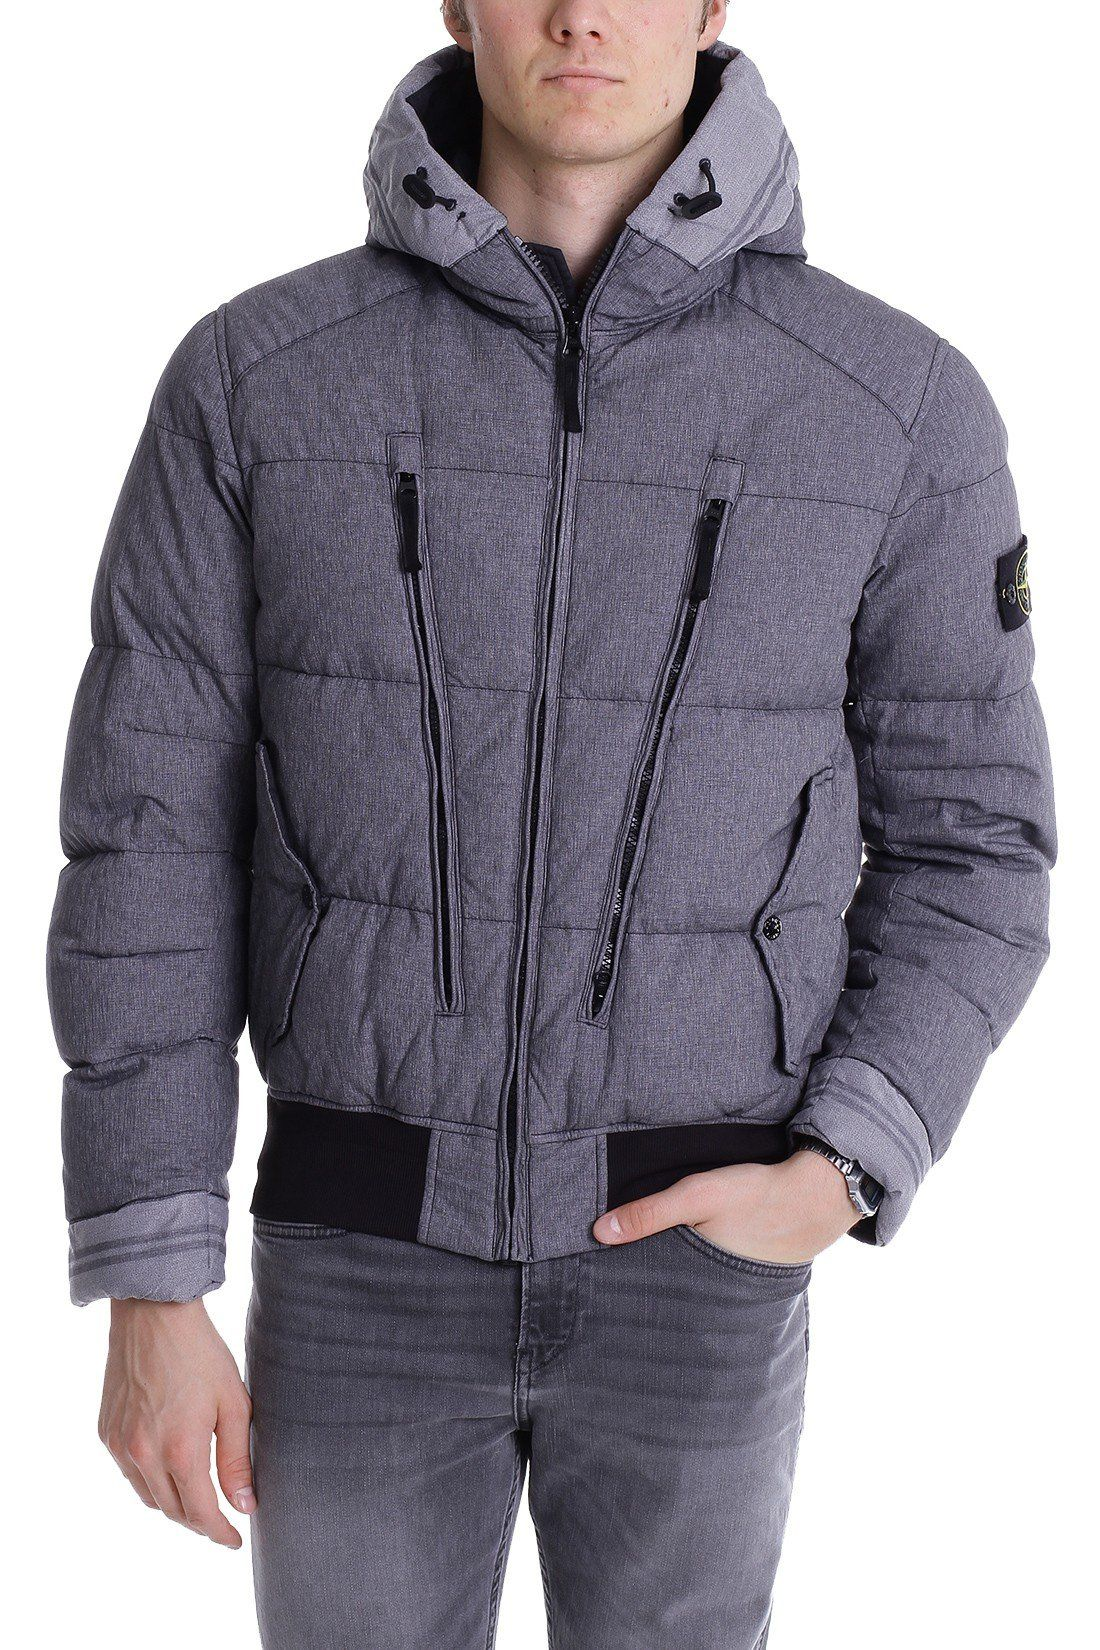 Stone Island Herren Jacke 611542048 In Blue Grey V0063 Farbe Grau Grosse M Amazon De Bekleidung Jacken Herren Jacken Bekleidung